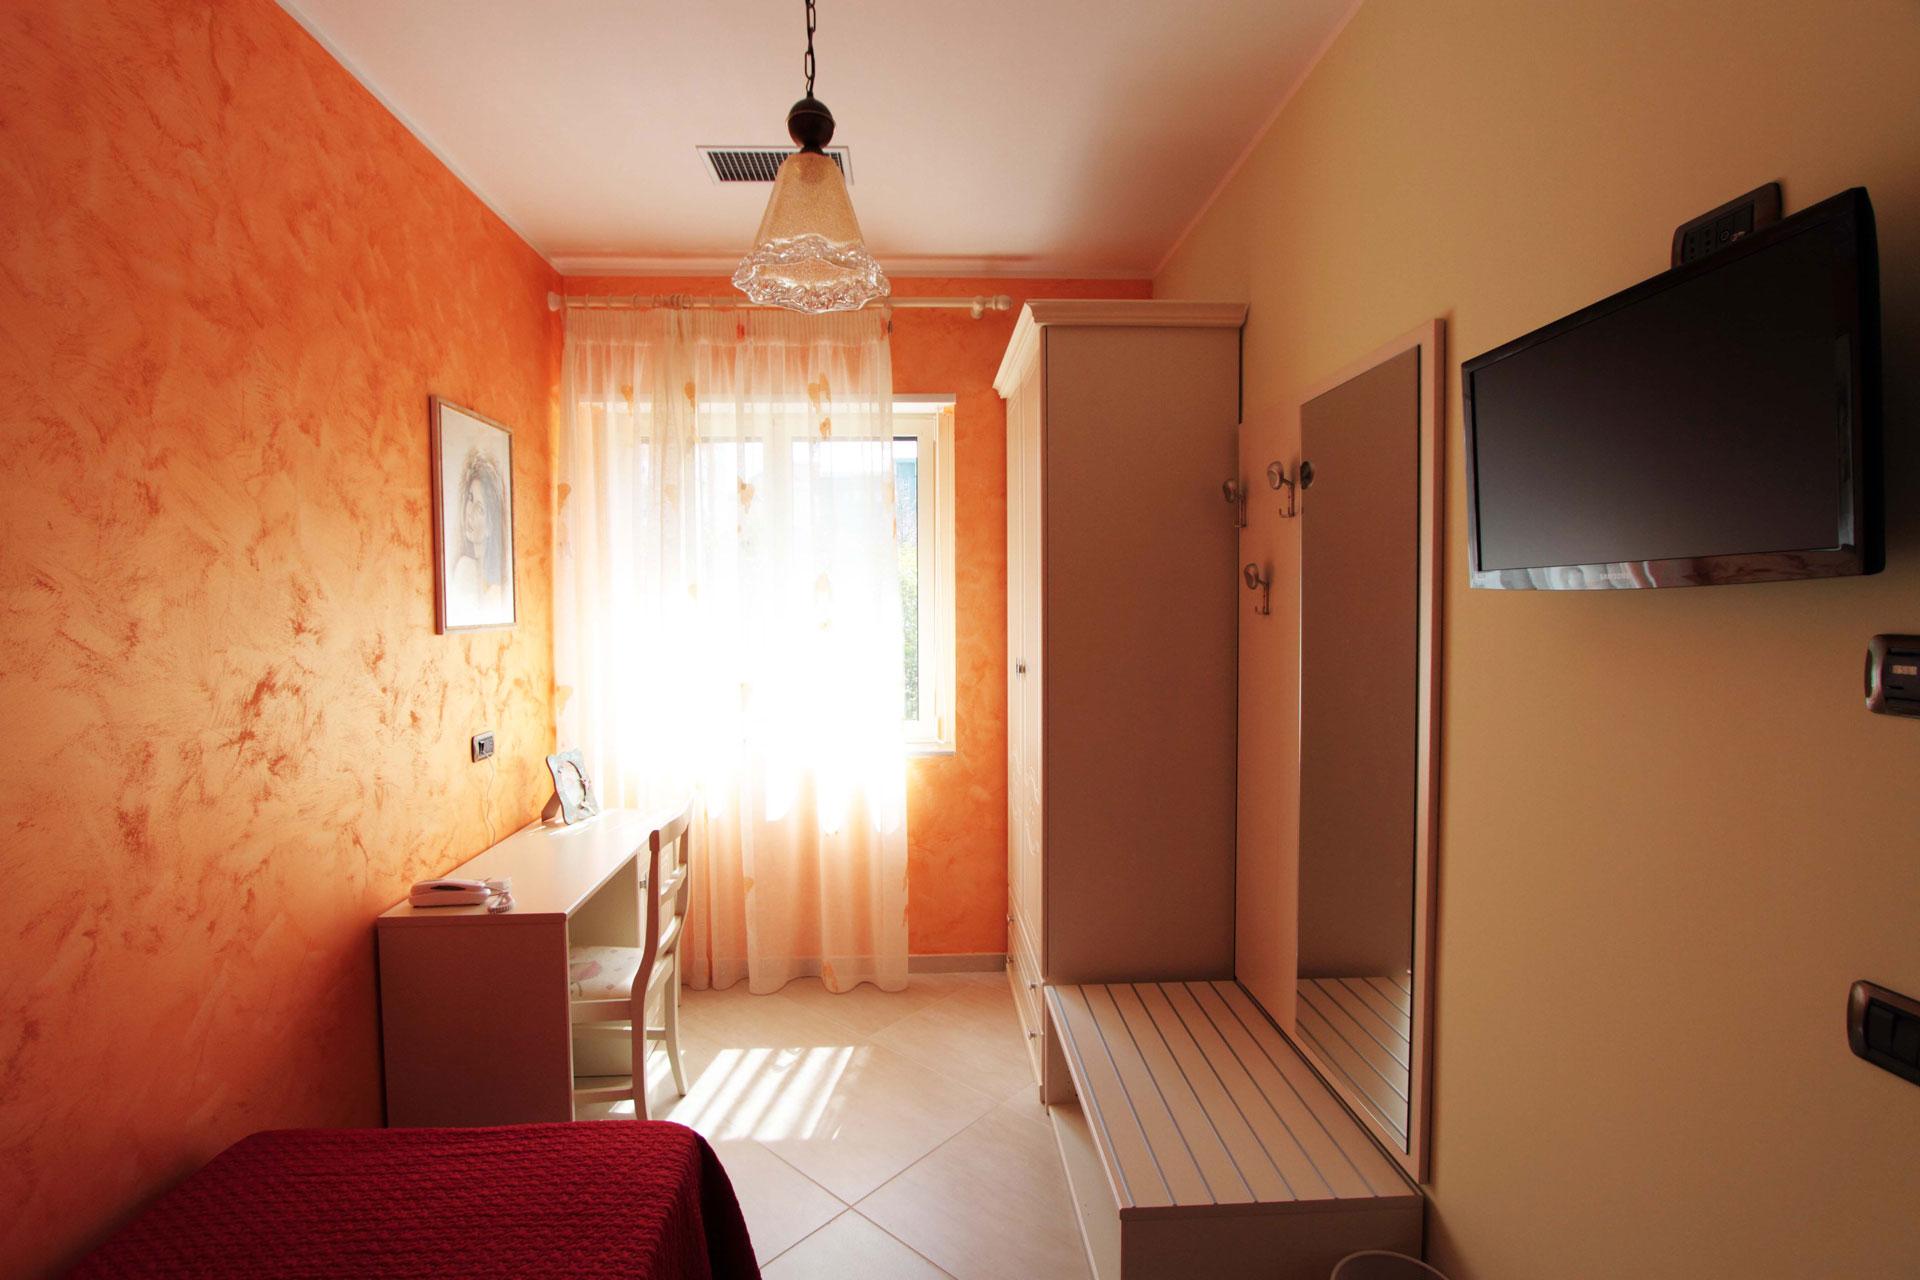 Camera singola - Arcobaleno B&B, potenza, basilicata, italia -